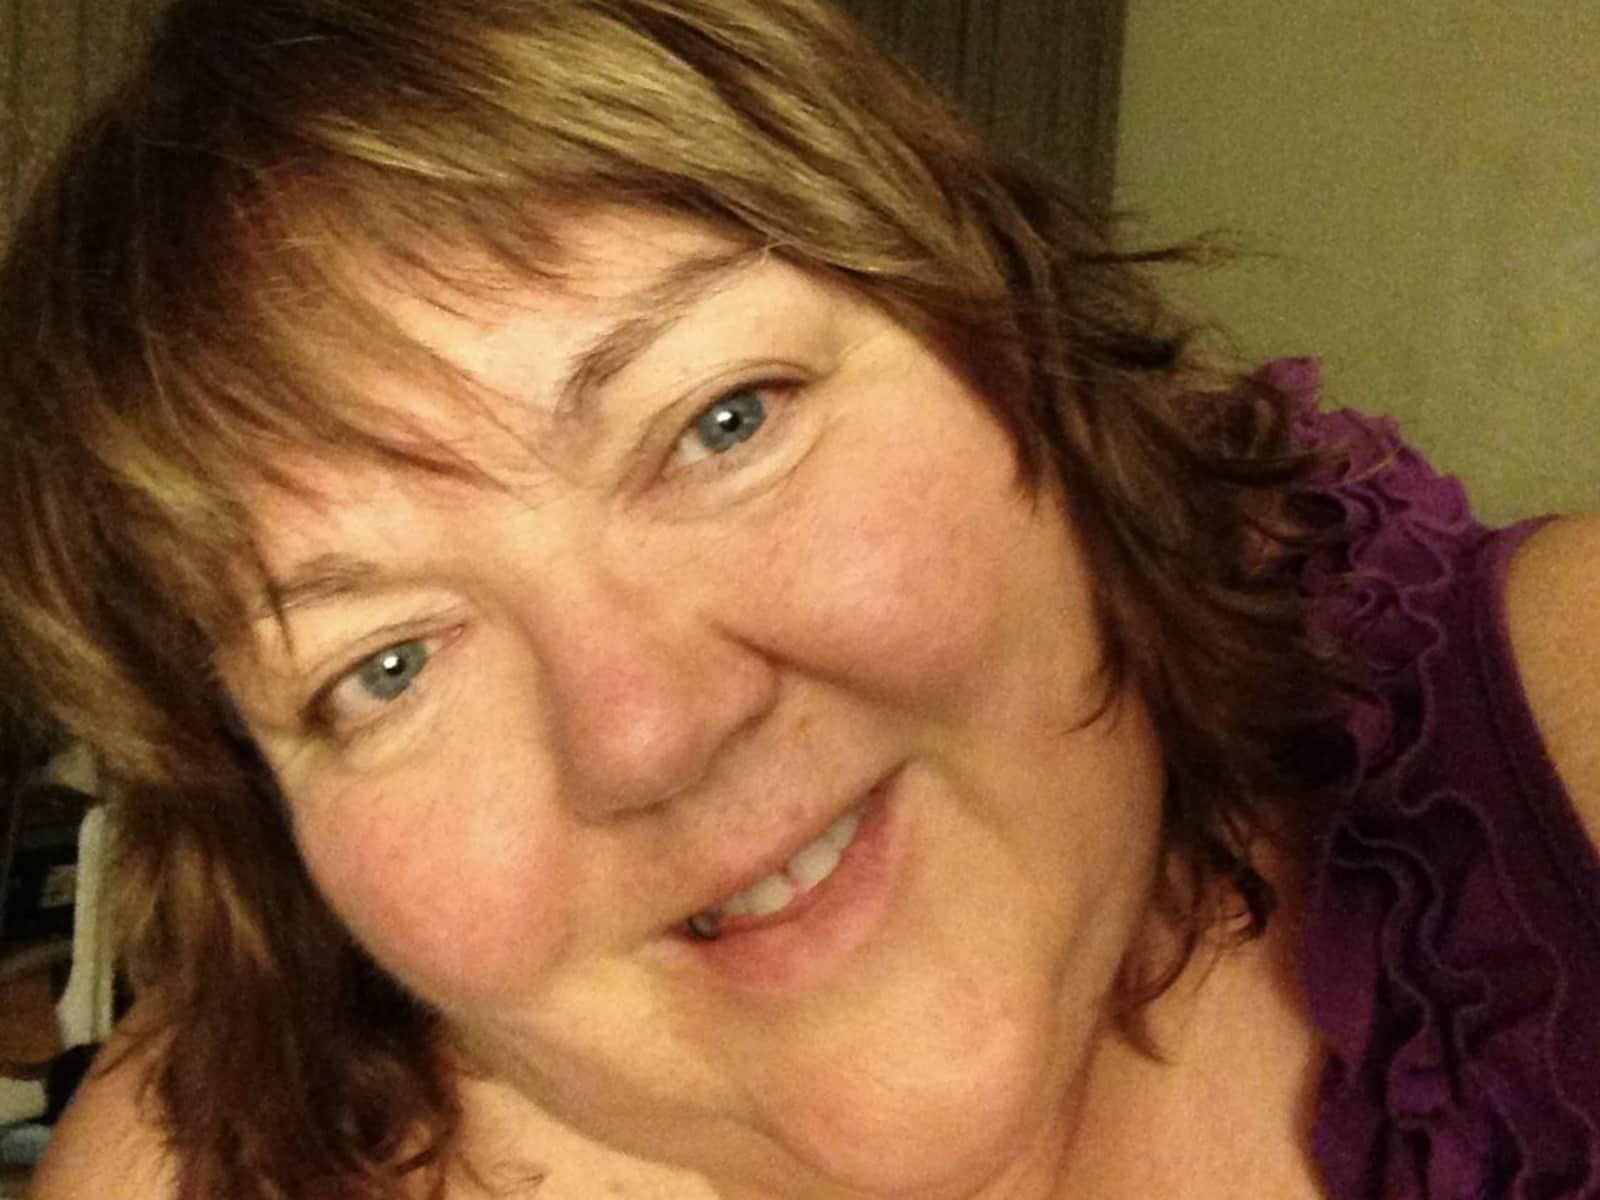 Annette from Palo Alto, California, United States